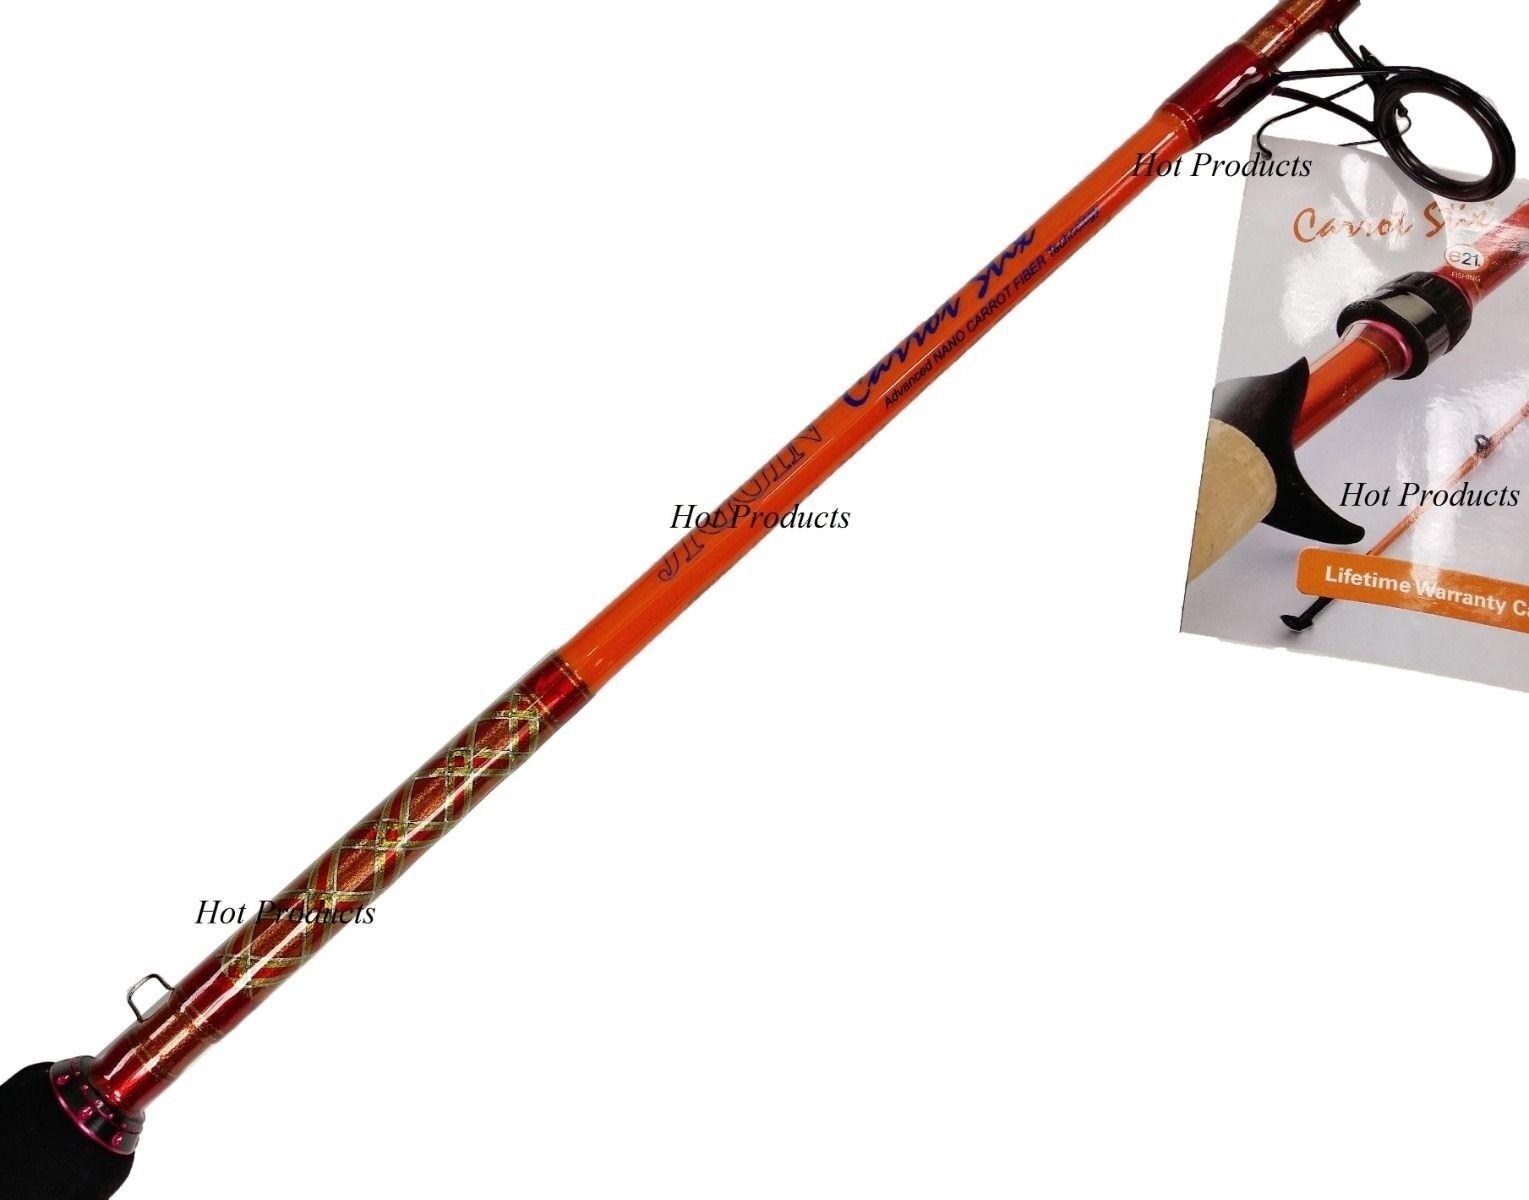 Carrot Stix JIGGING 6' 6  20-40 Lb SPINNING Saltwater Fishing Rod JCS661MH-S